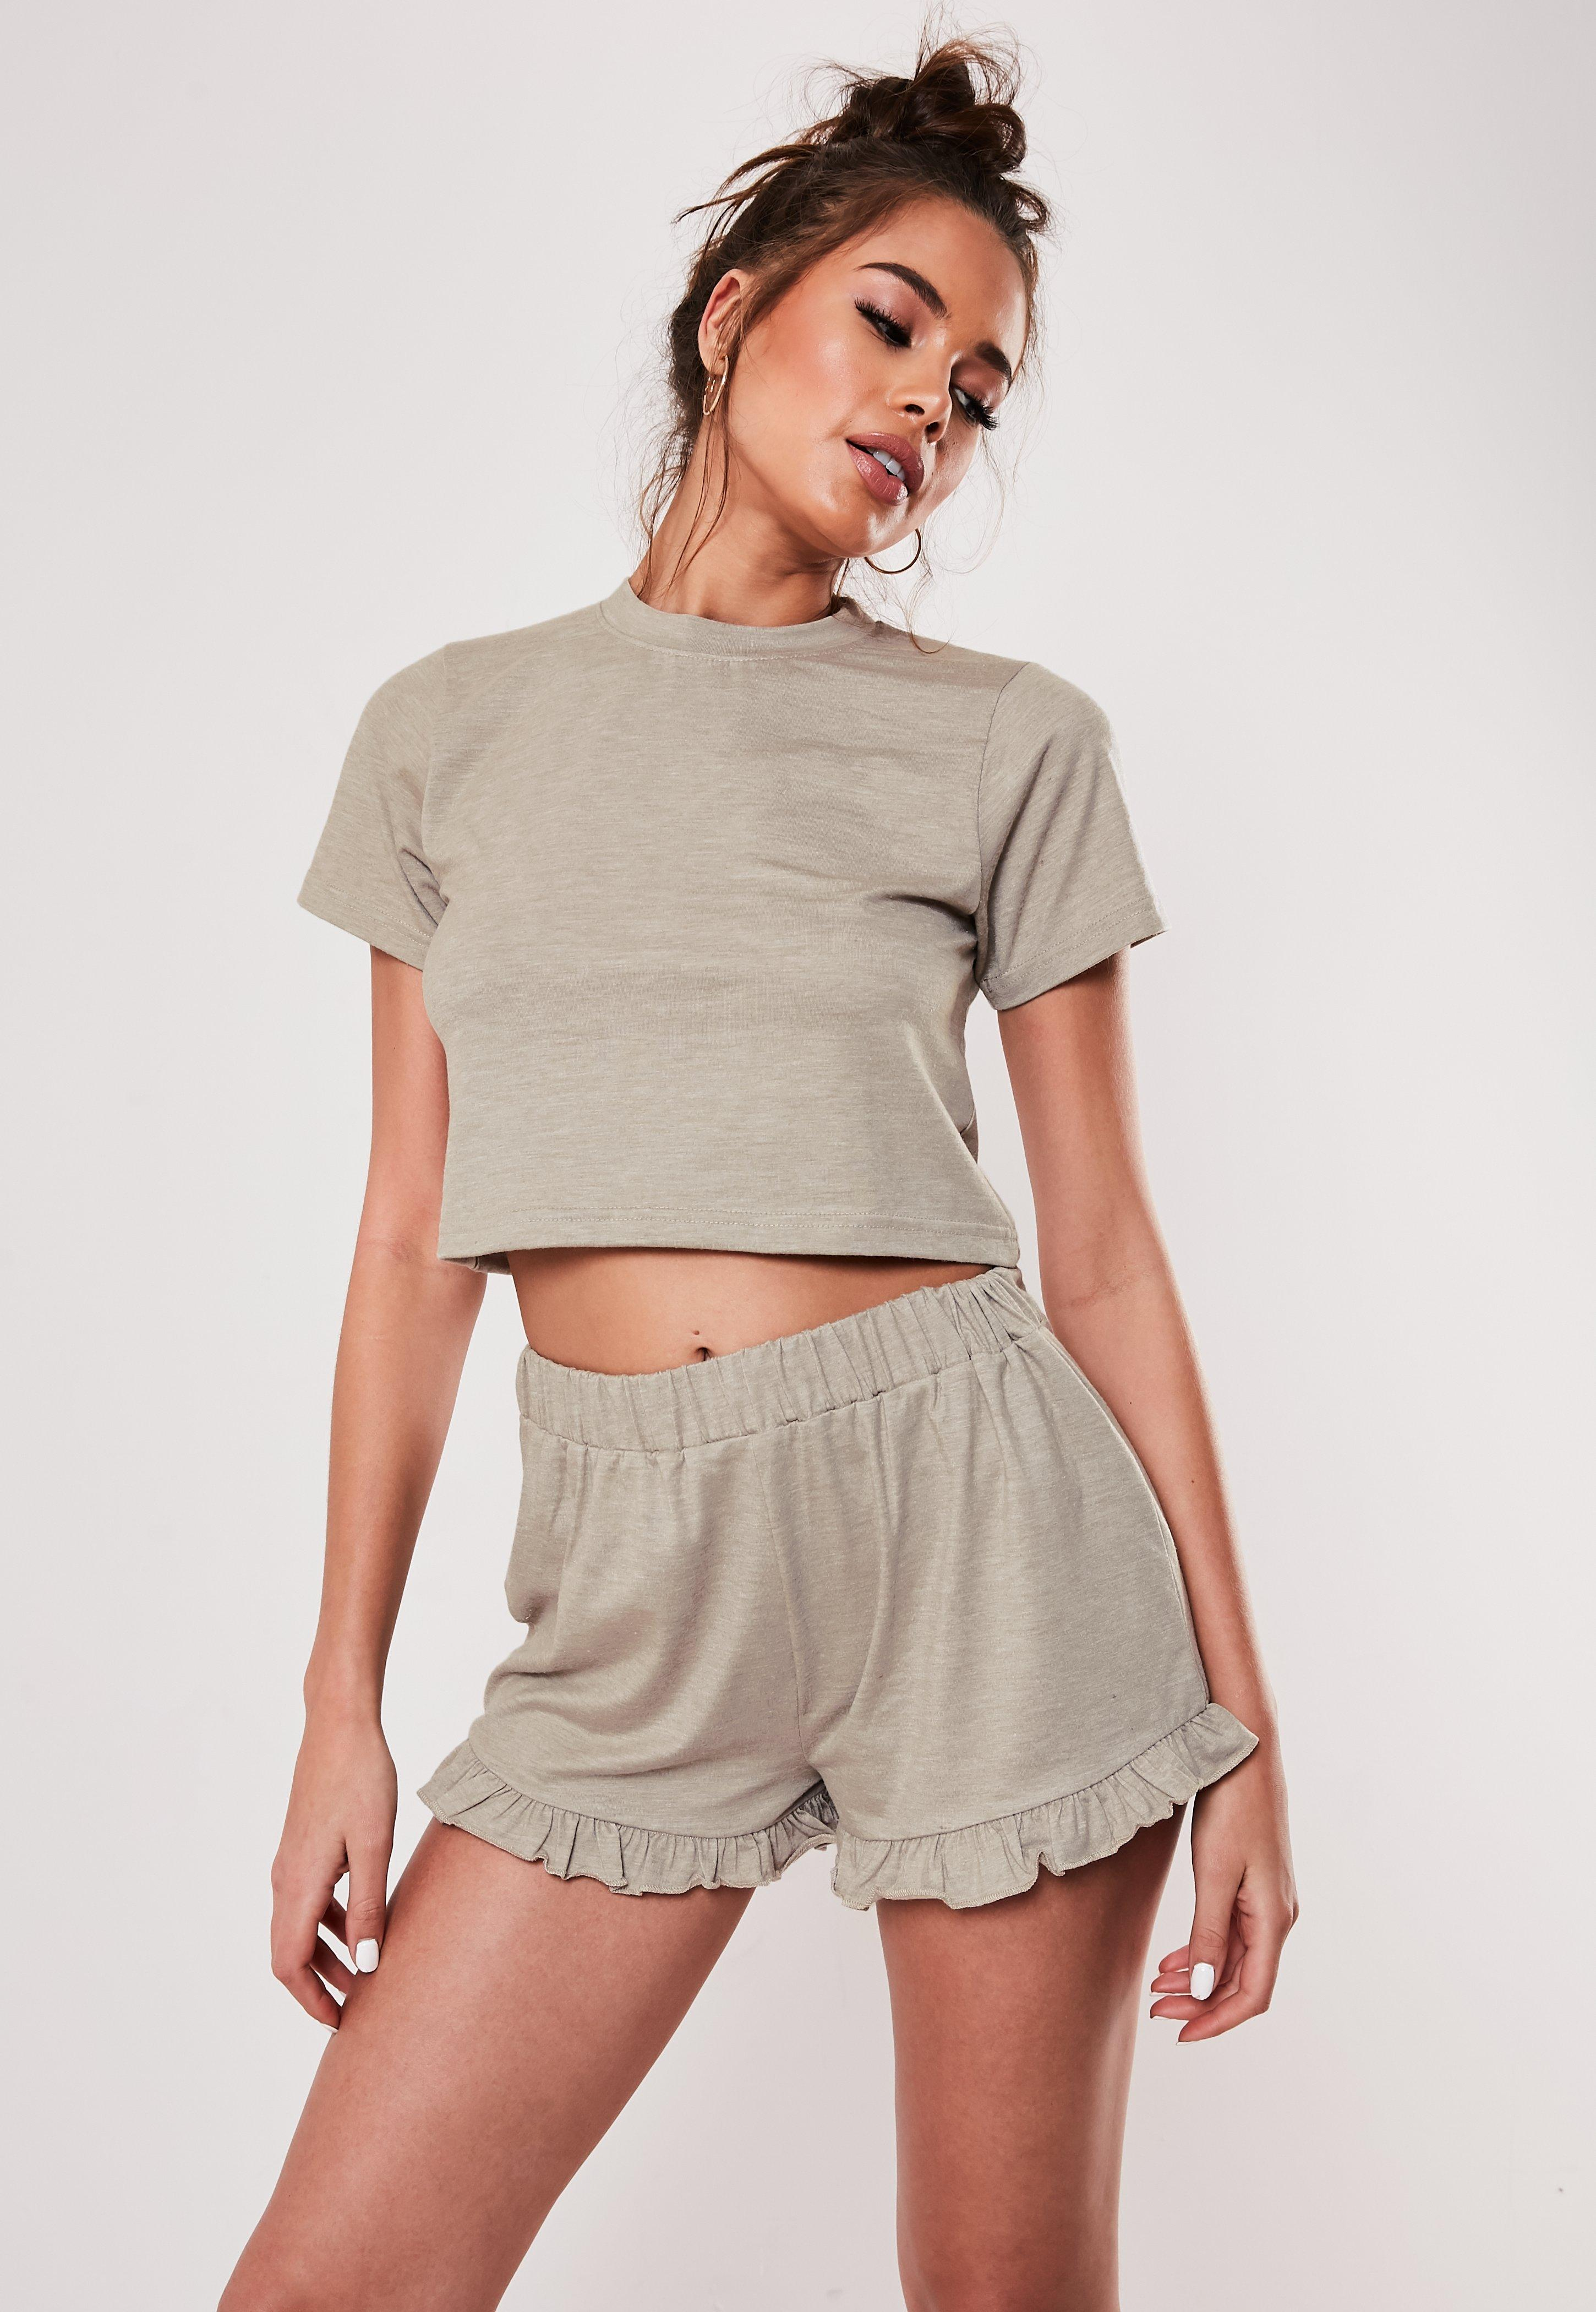 8d12fa540d4ba7 Pyjamas   Women's PJs Sets - Missguided